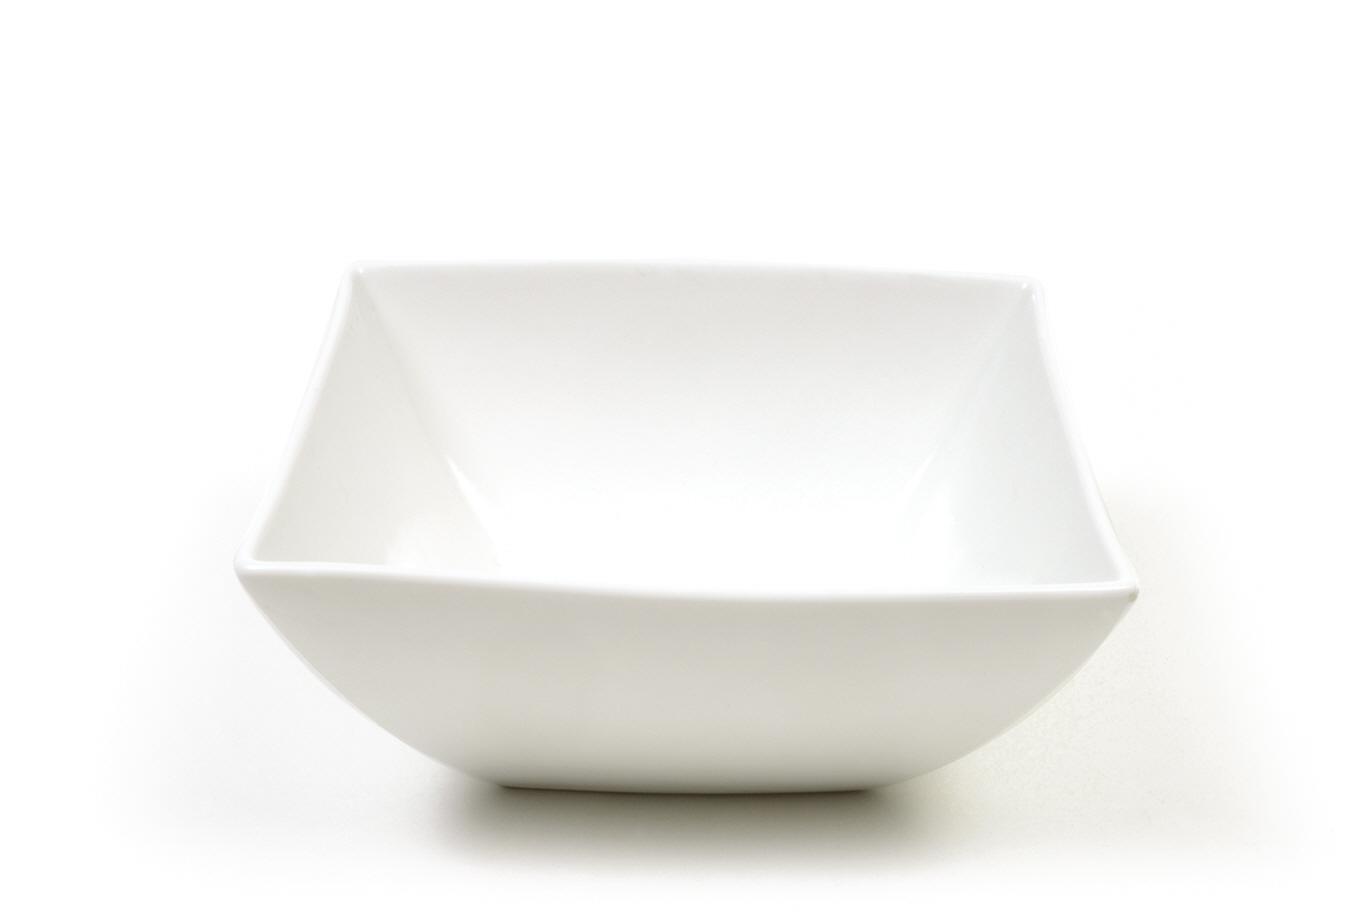 Čtvercová polévková miska East Meets West 16 x 16 cm - Maxwell&William